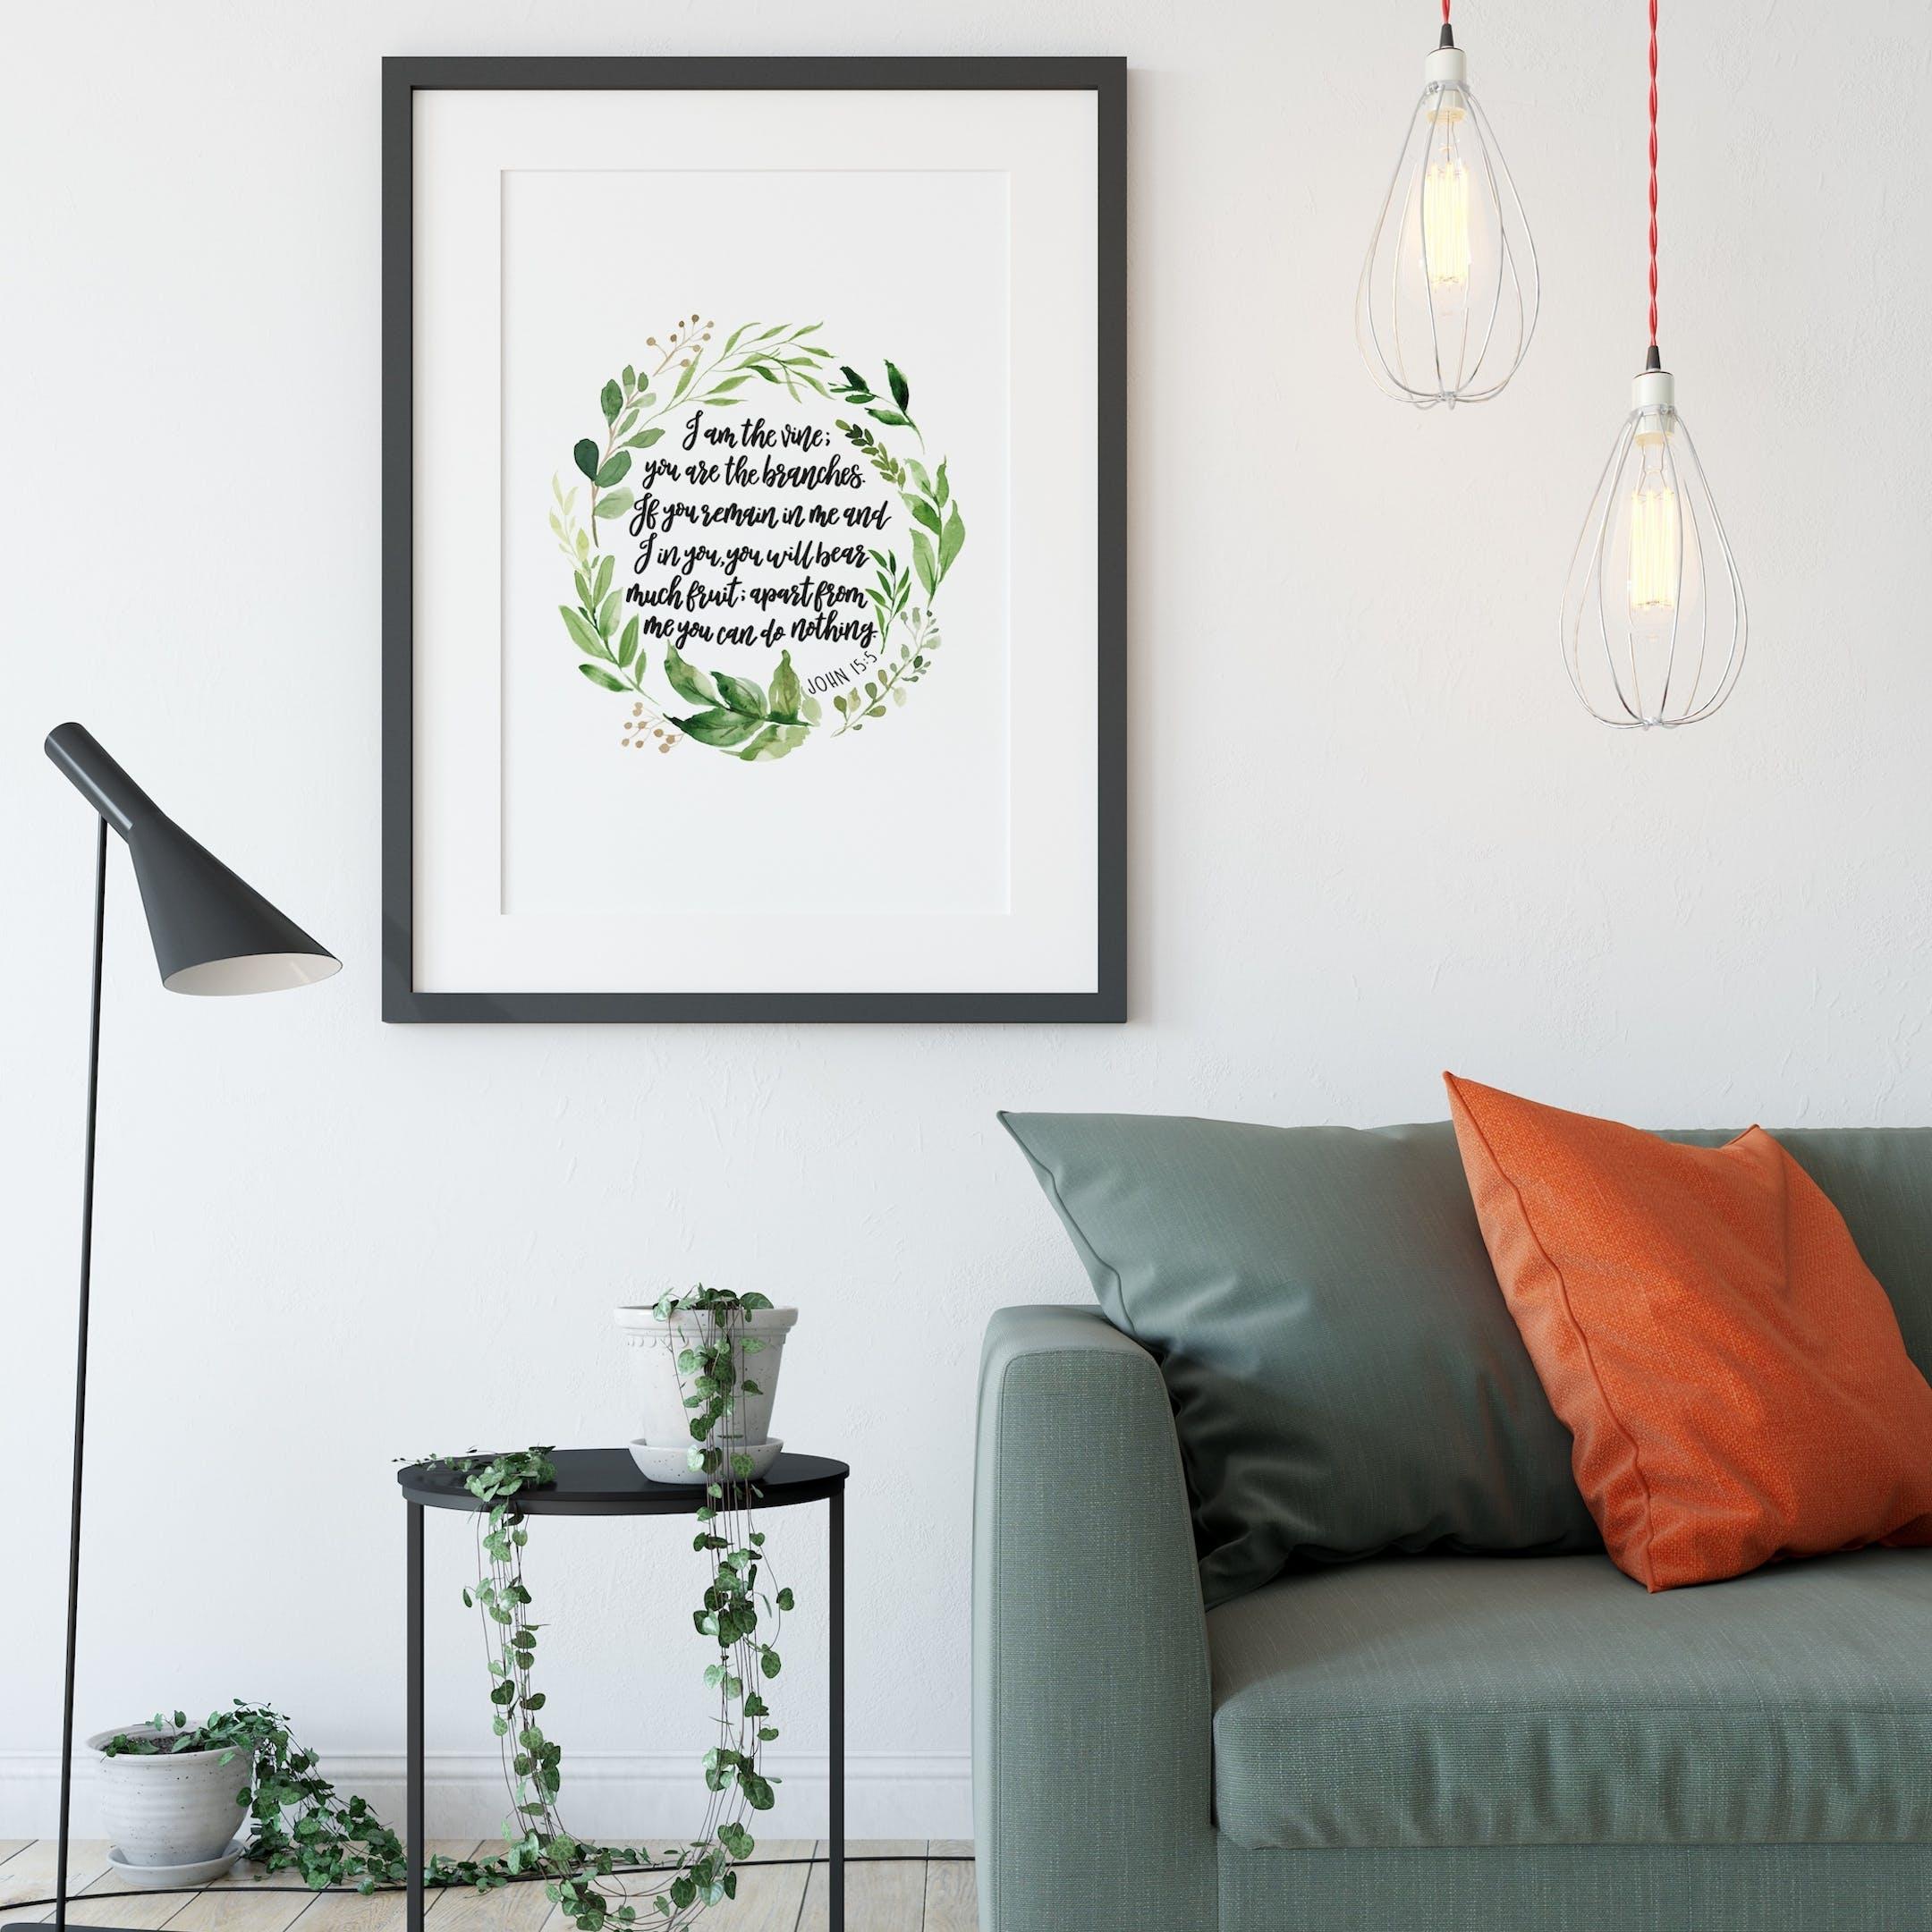 I Am The Vine - John 15:5 Print - Watercolour Wreath - Izzy and Pop